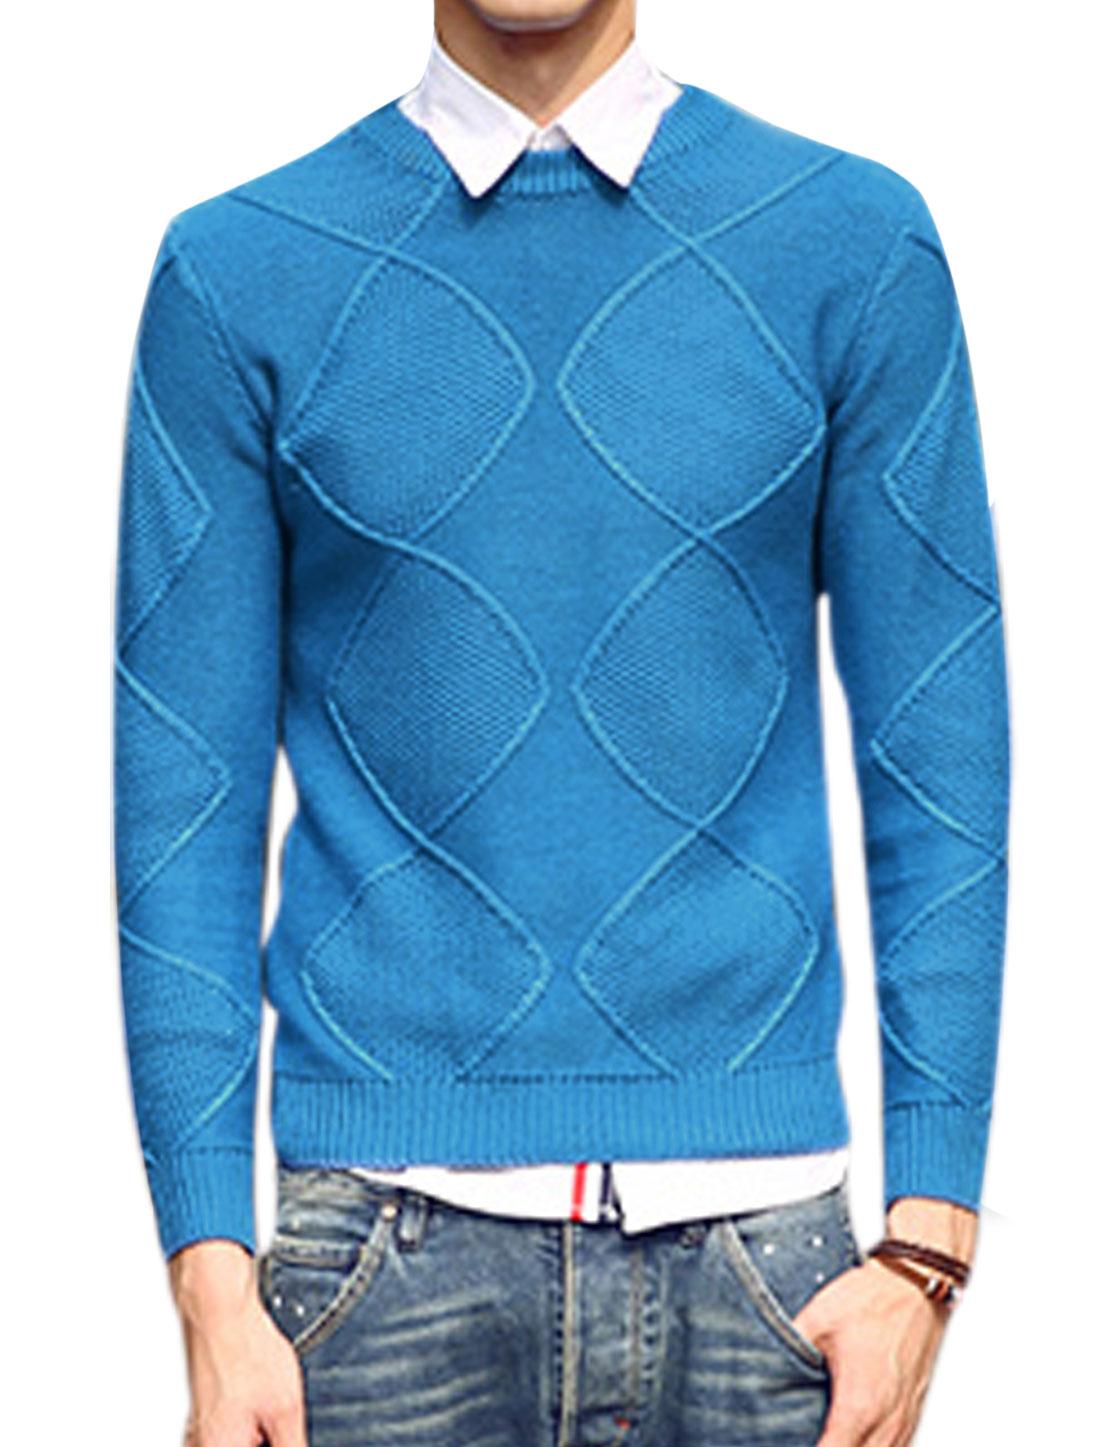 Men Crew Neck Argyle Design Ribbed Hem Fashion Sweater Blue M